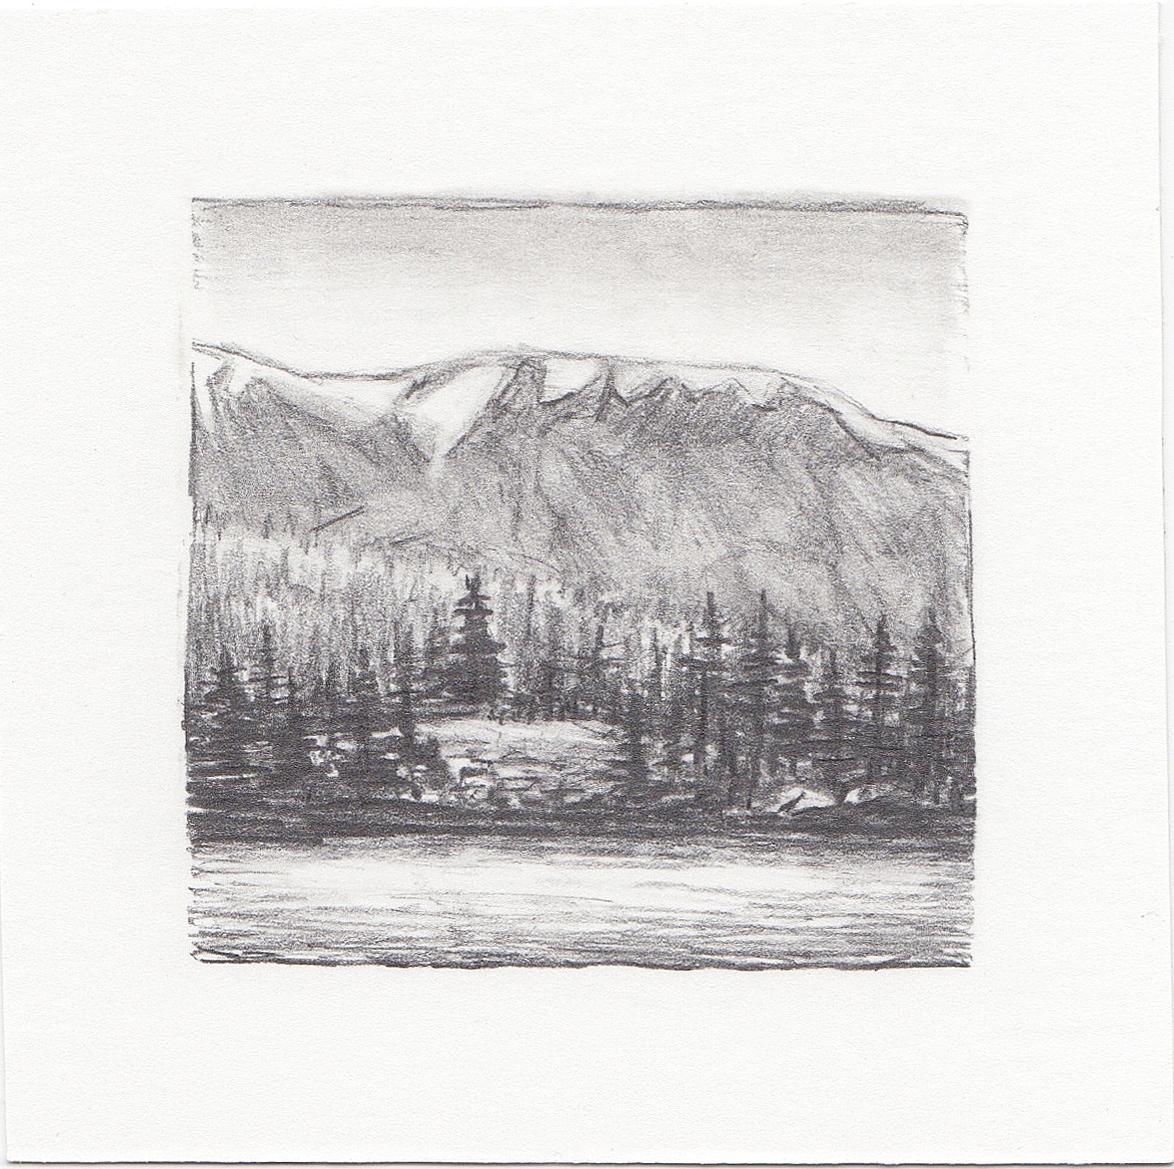 #37 Uinta Mountains, Utah | 3x3 | graphite